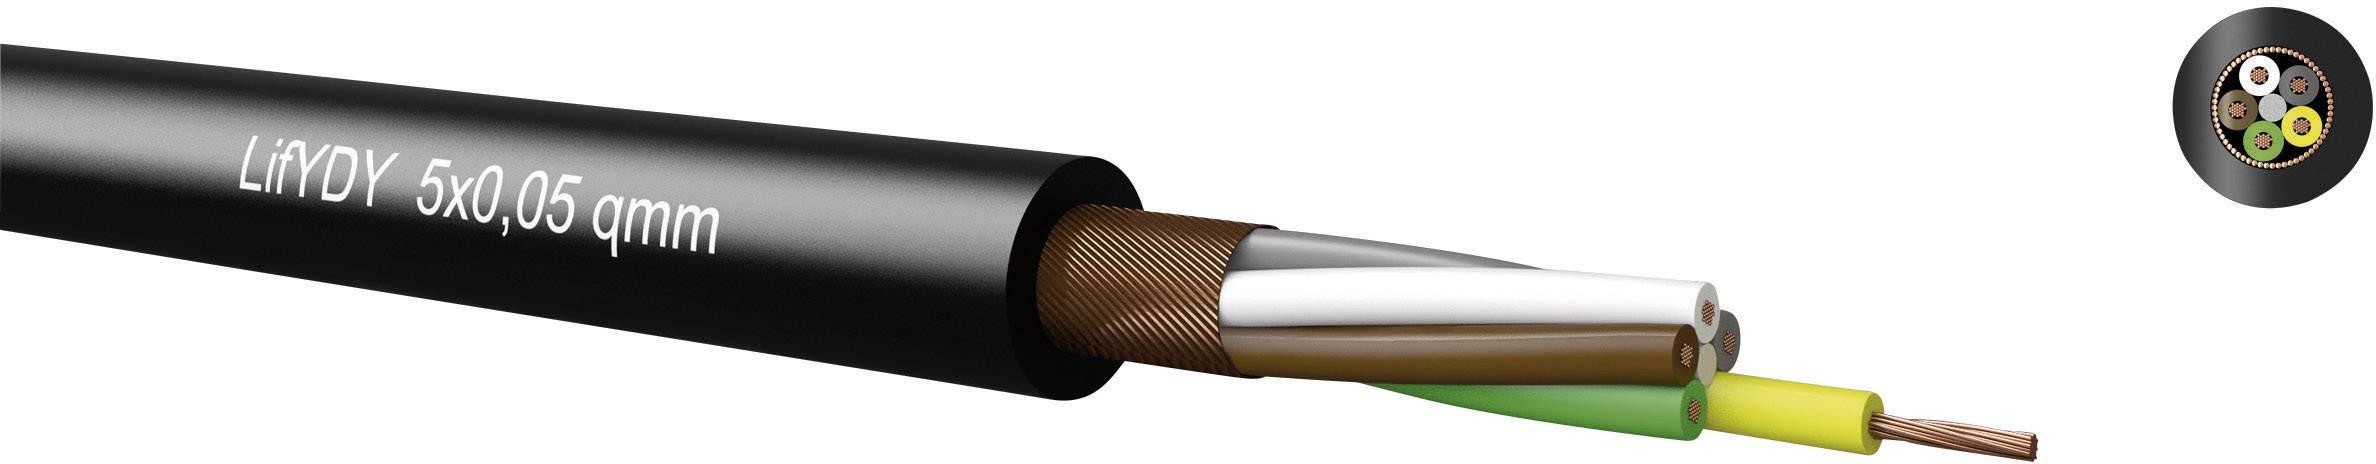 Riadiaci kábel Kabeltronik LifYDY 341601000, 16 x 0.10 mm², vonkajší Ø 6.30 mm, 300 V, metrový tovar, čierna